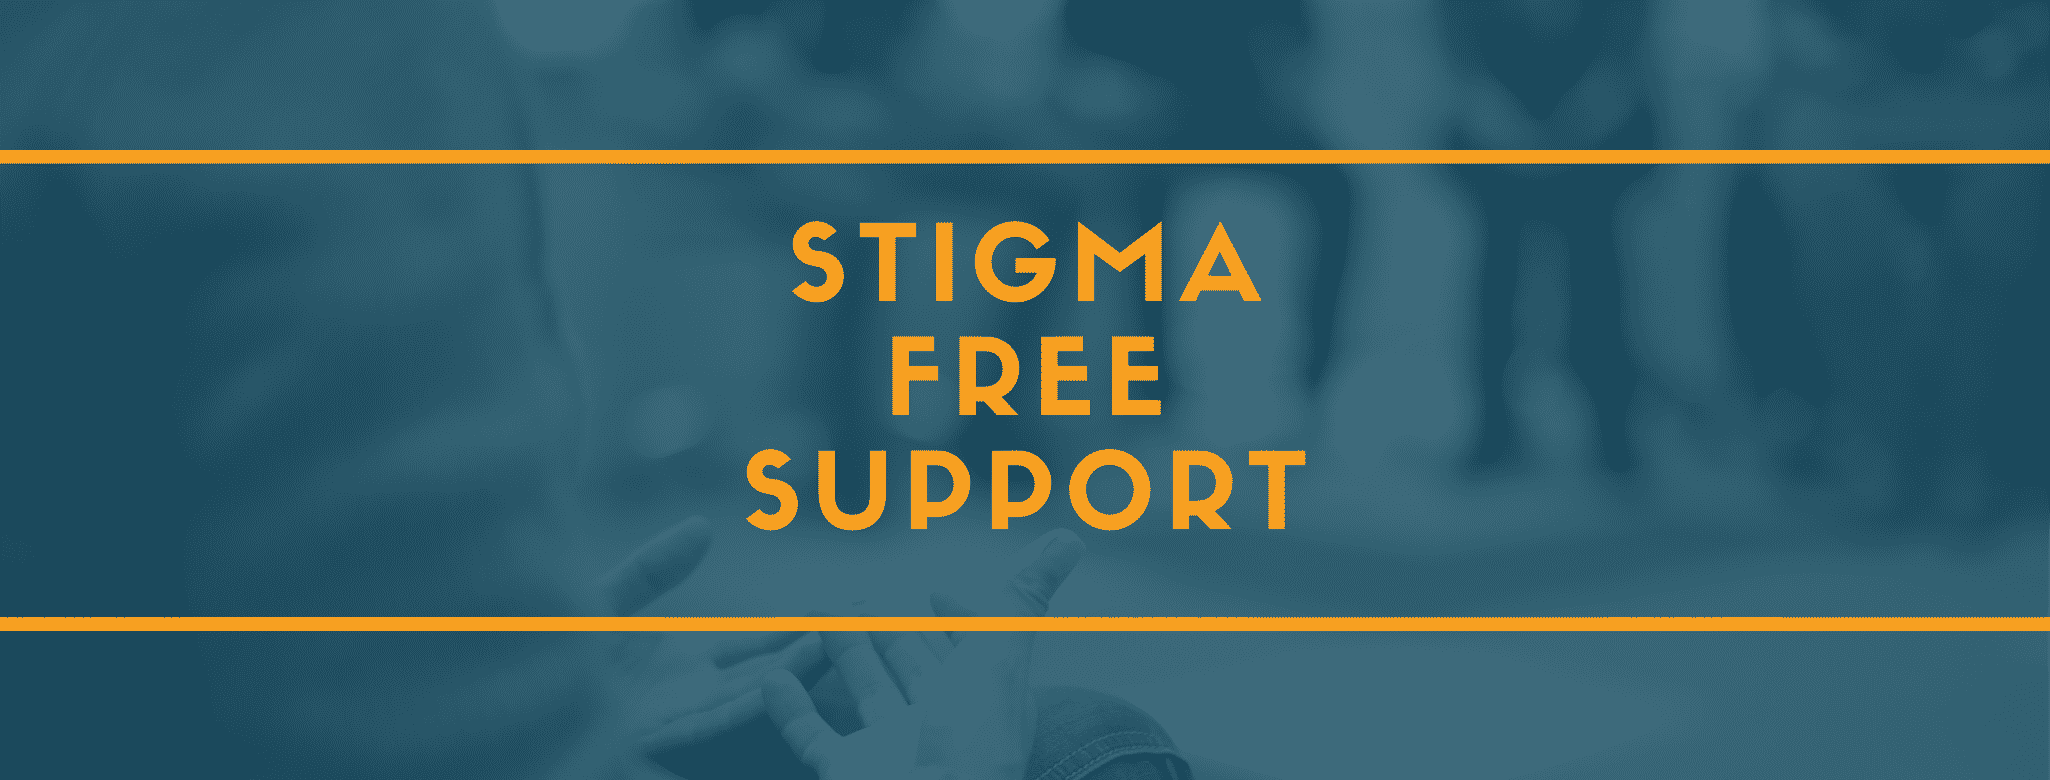 Stigma Free Addiction Support